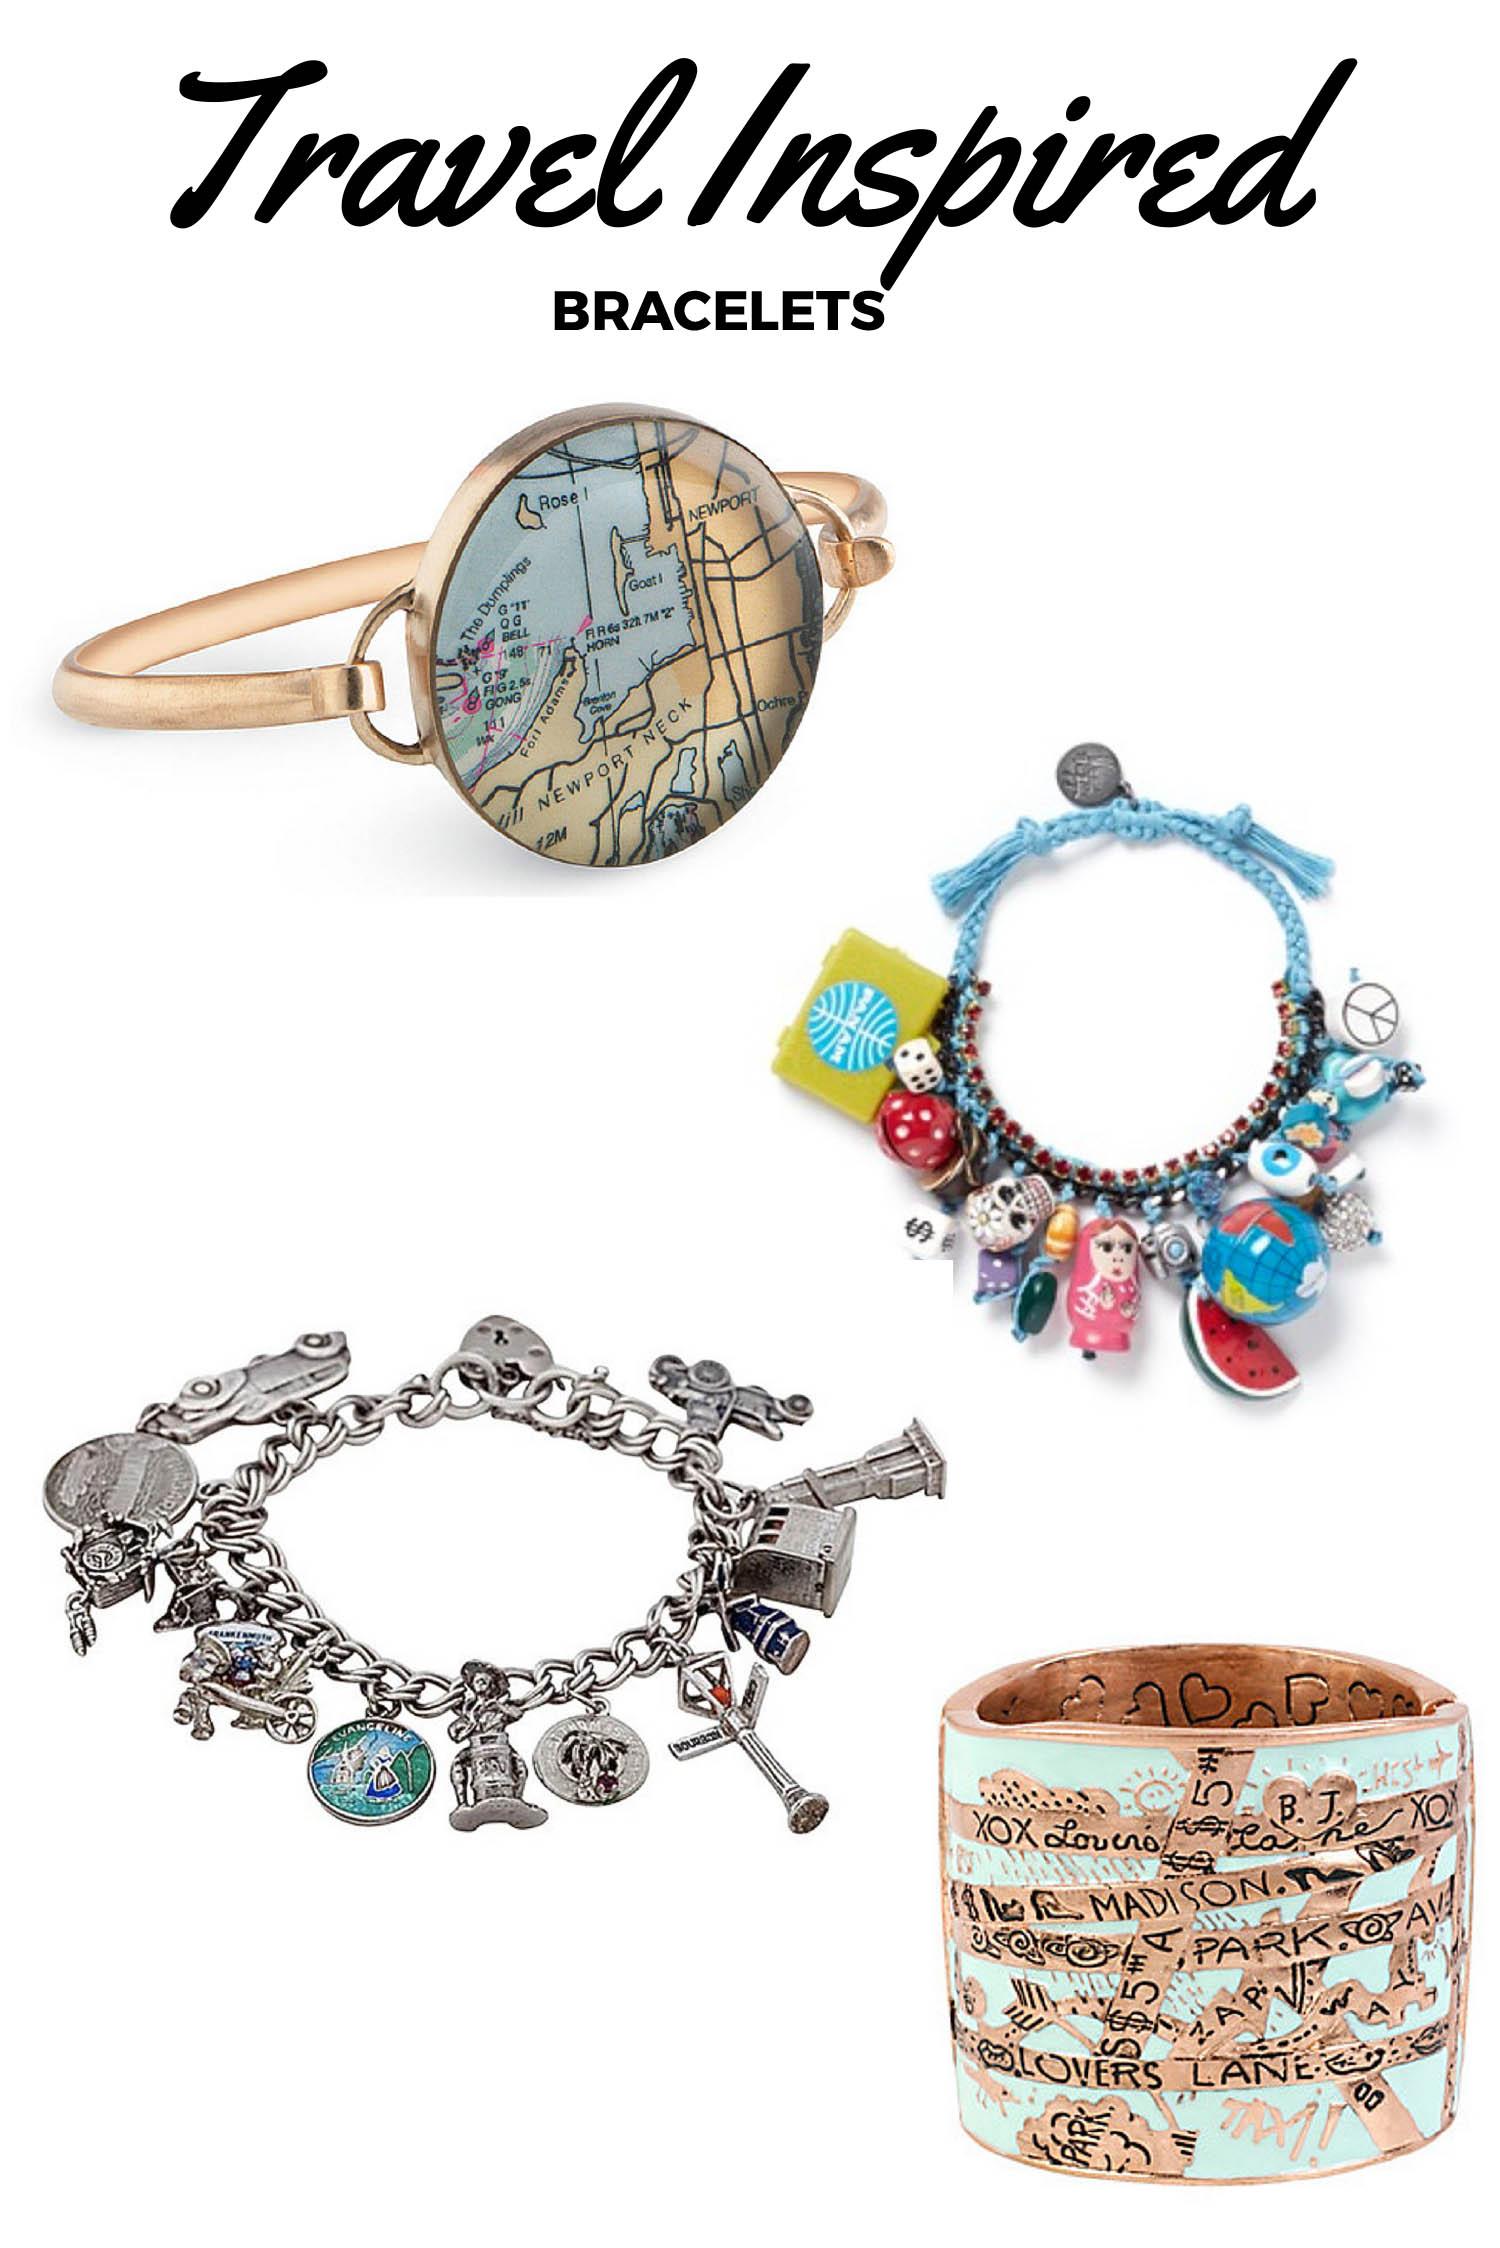 Travel-Inspired Bracelets - Travel Inspired Jewelry